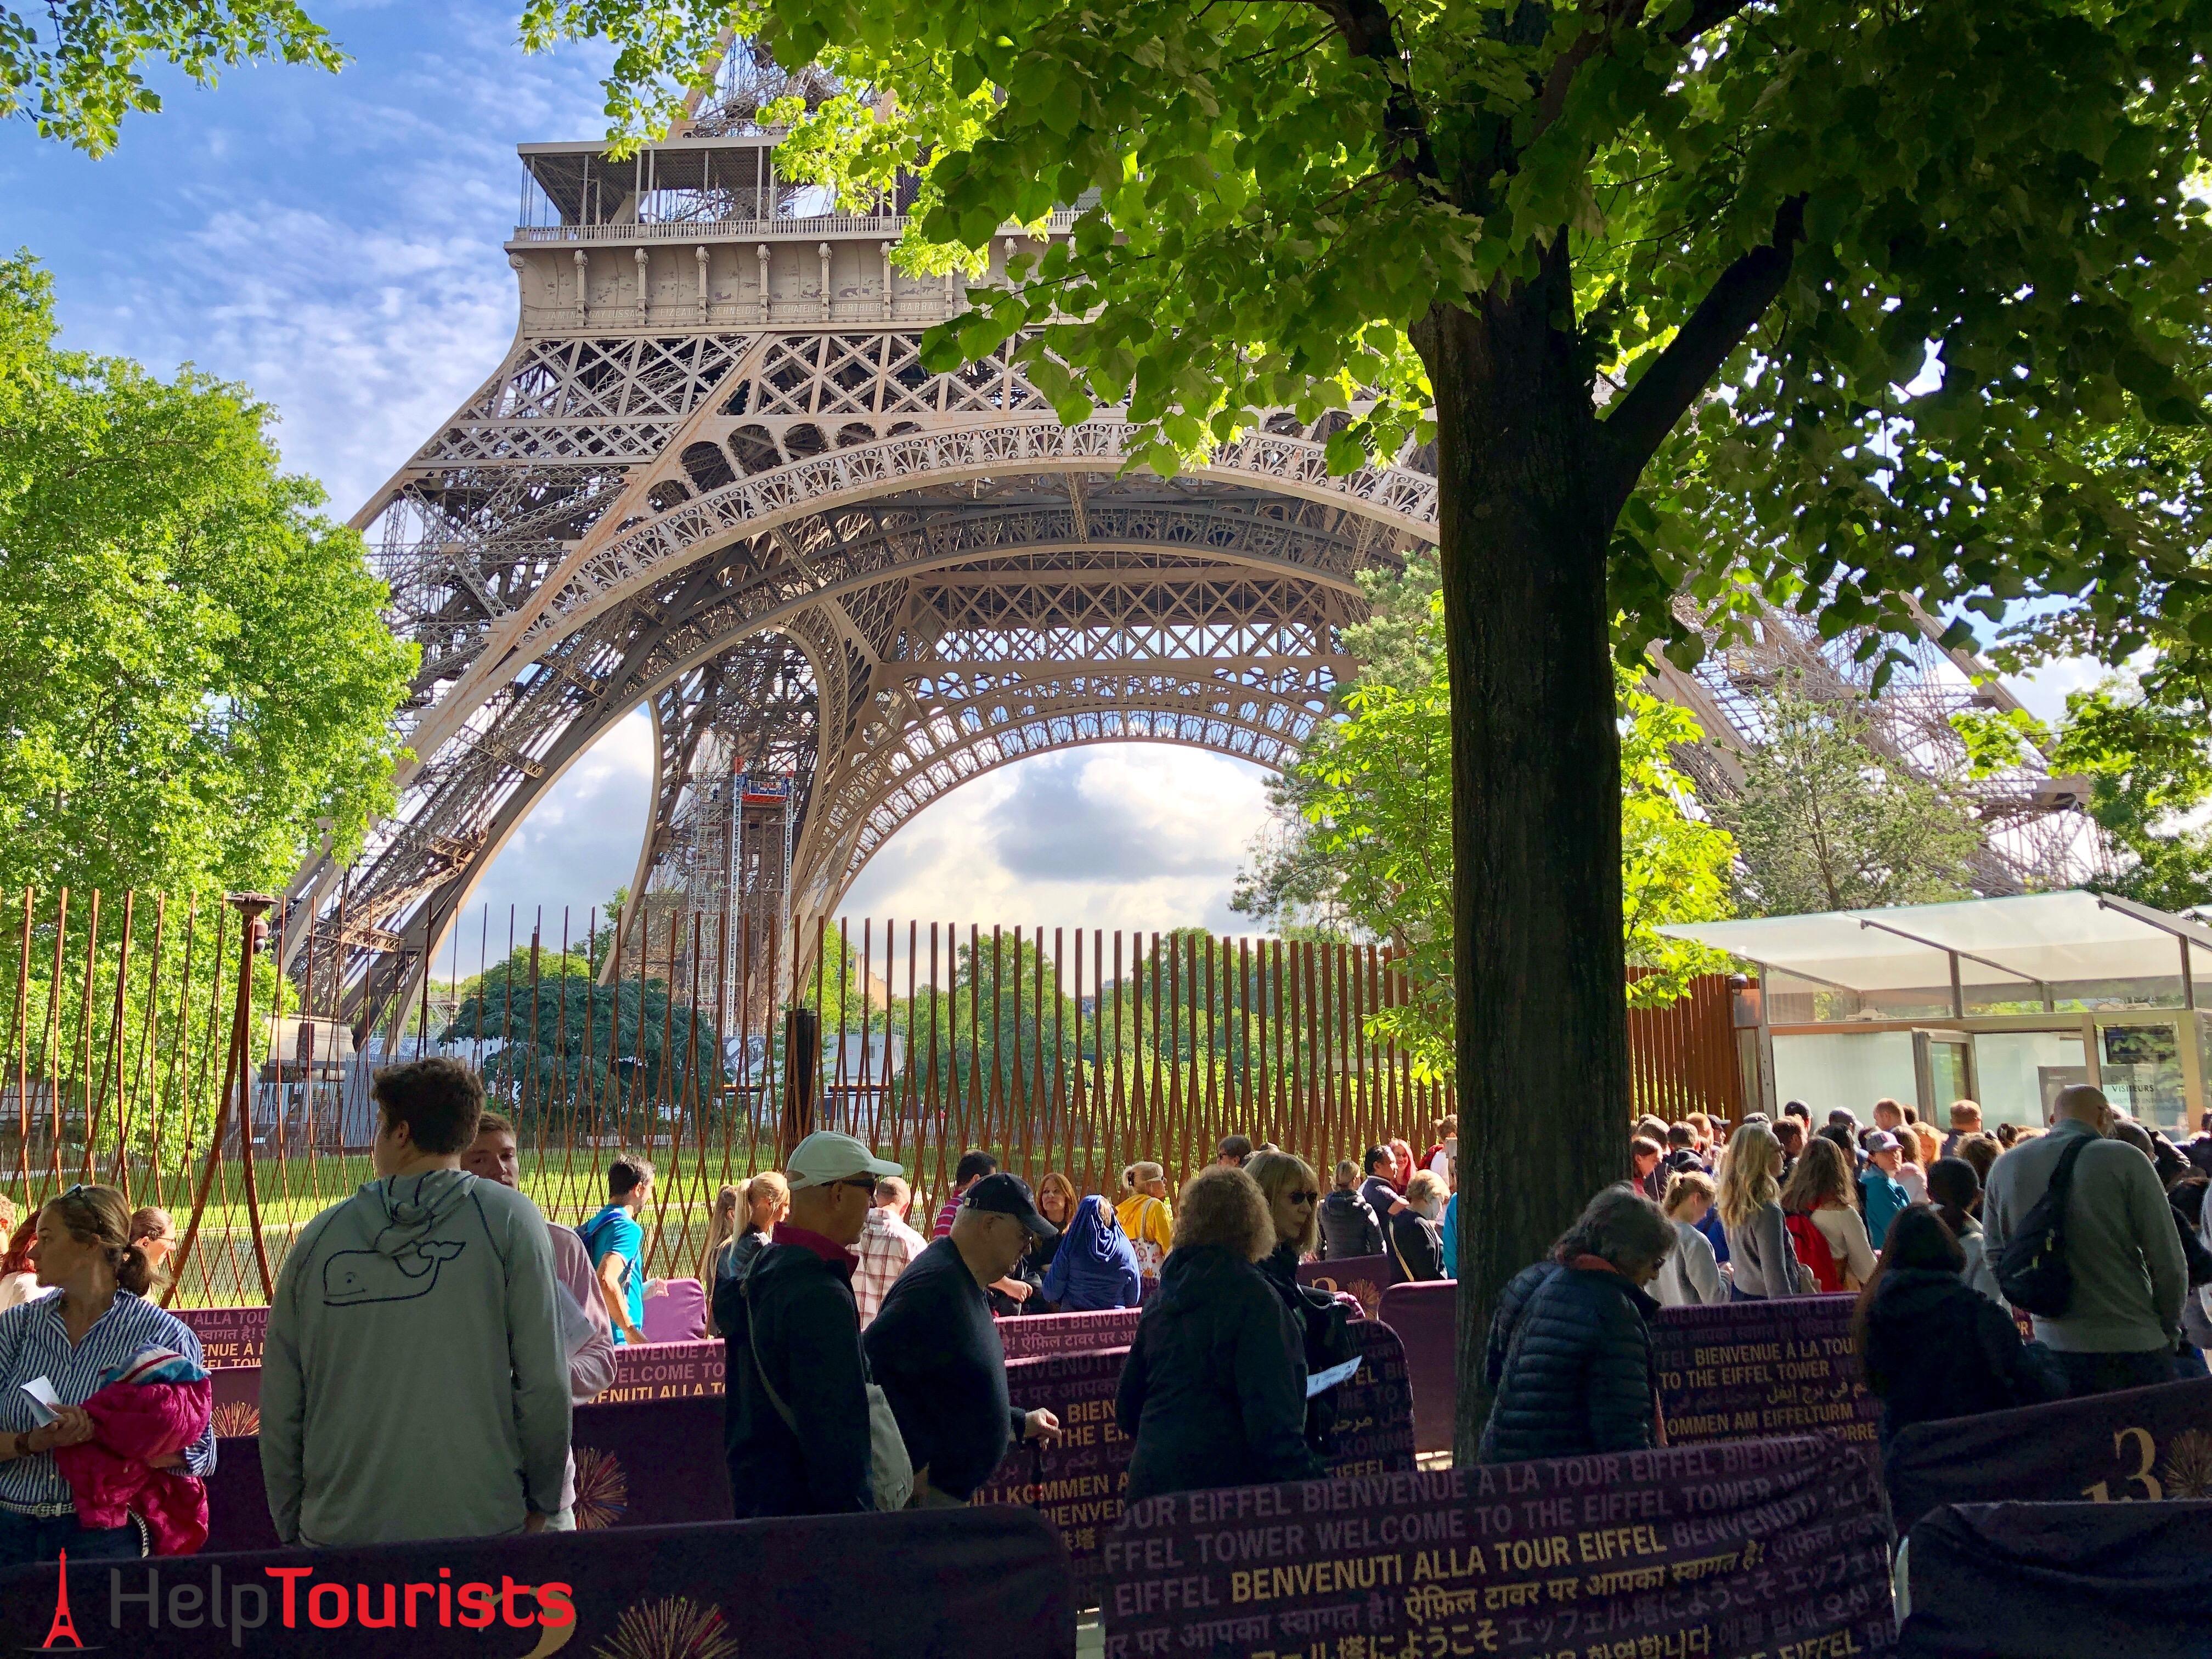 Wartezeit am Eiffelturm?